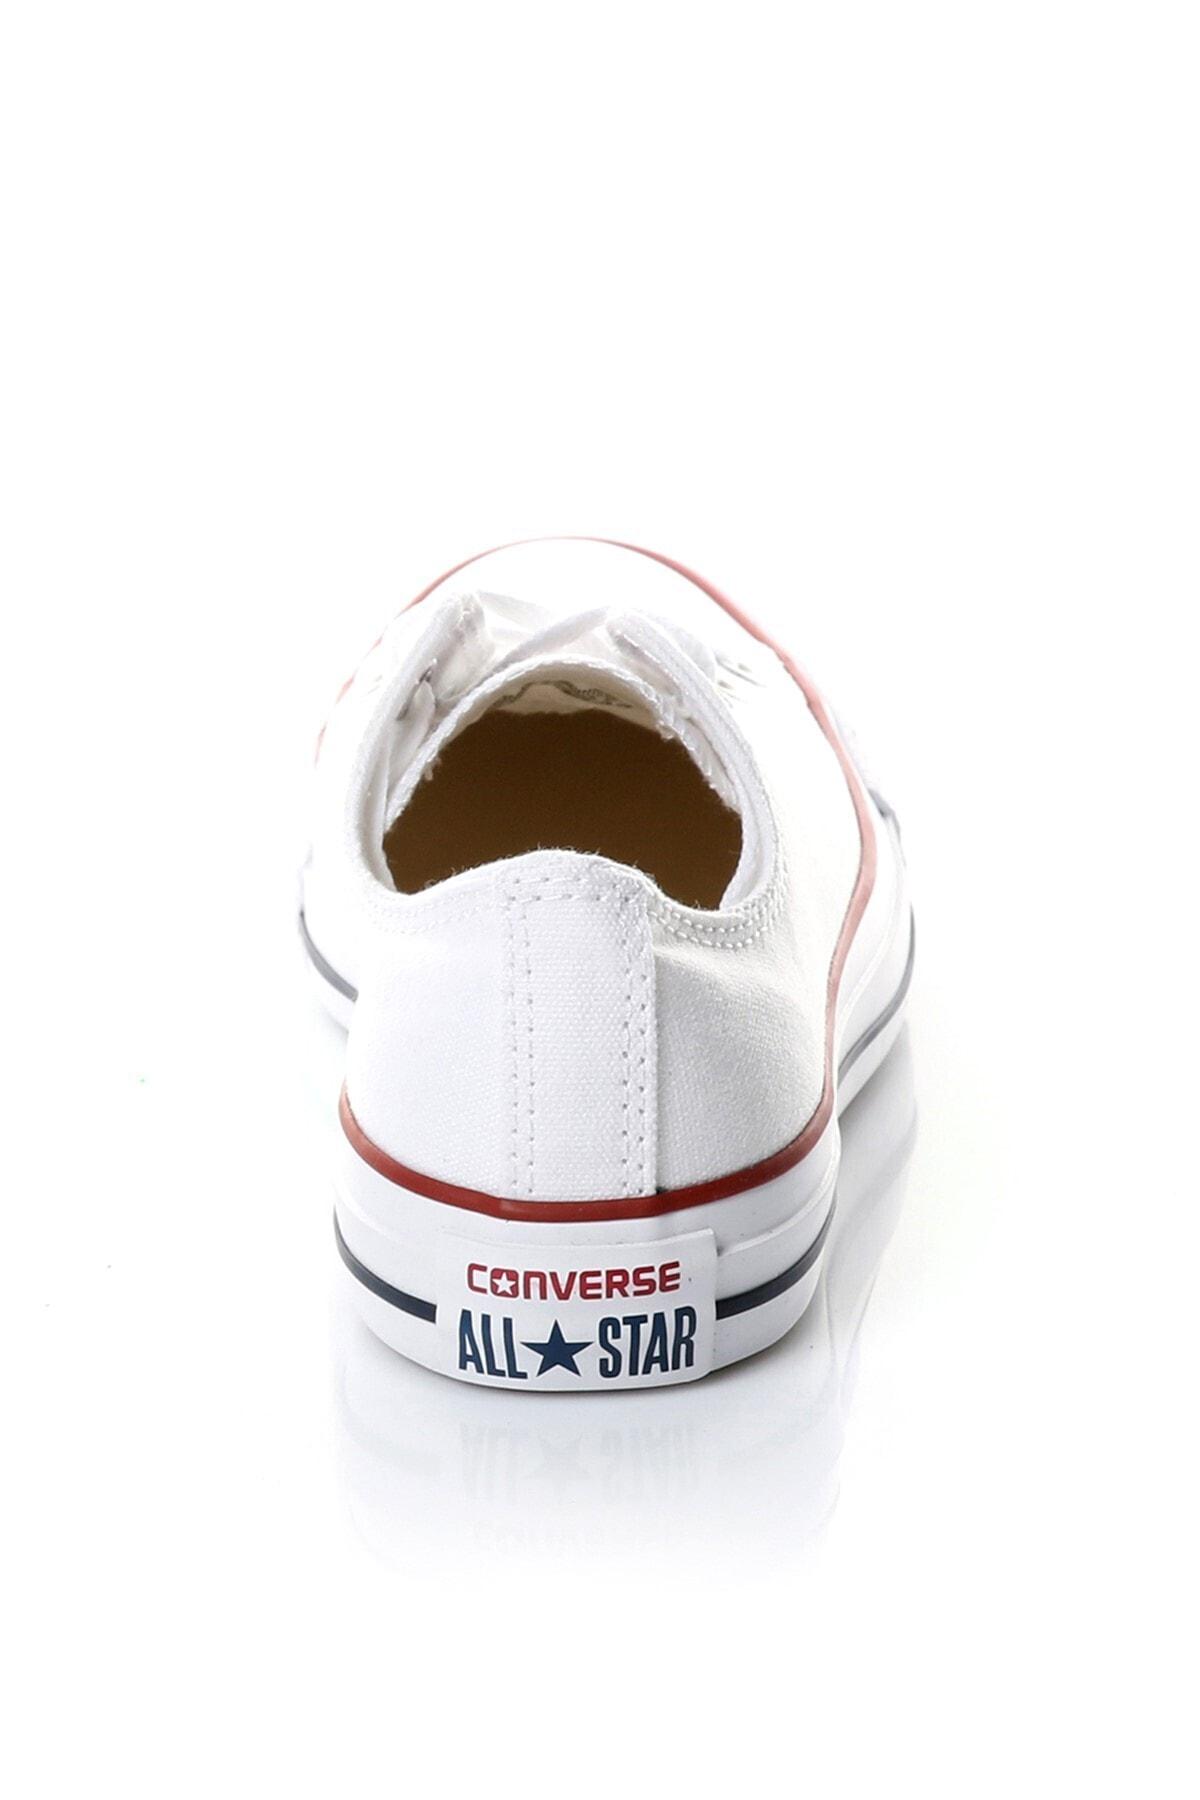 converse Beyaz Kadın / Kız Sneaker M7652c Chuck Taylor All Star Optıcal White Canvas 2